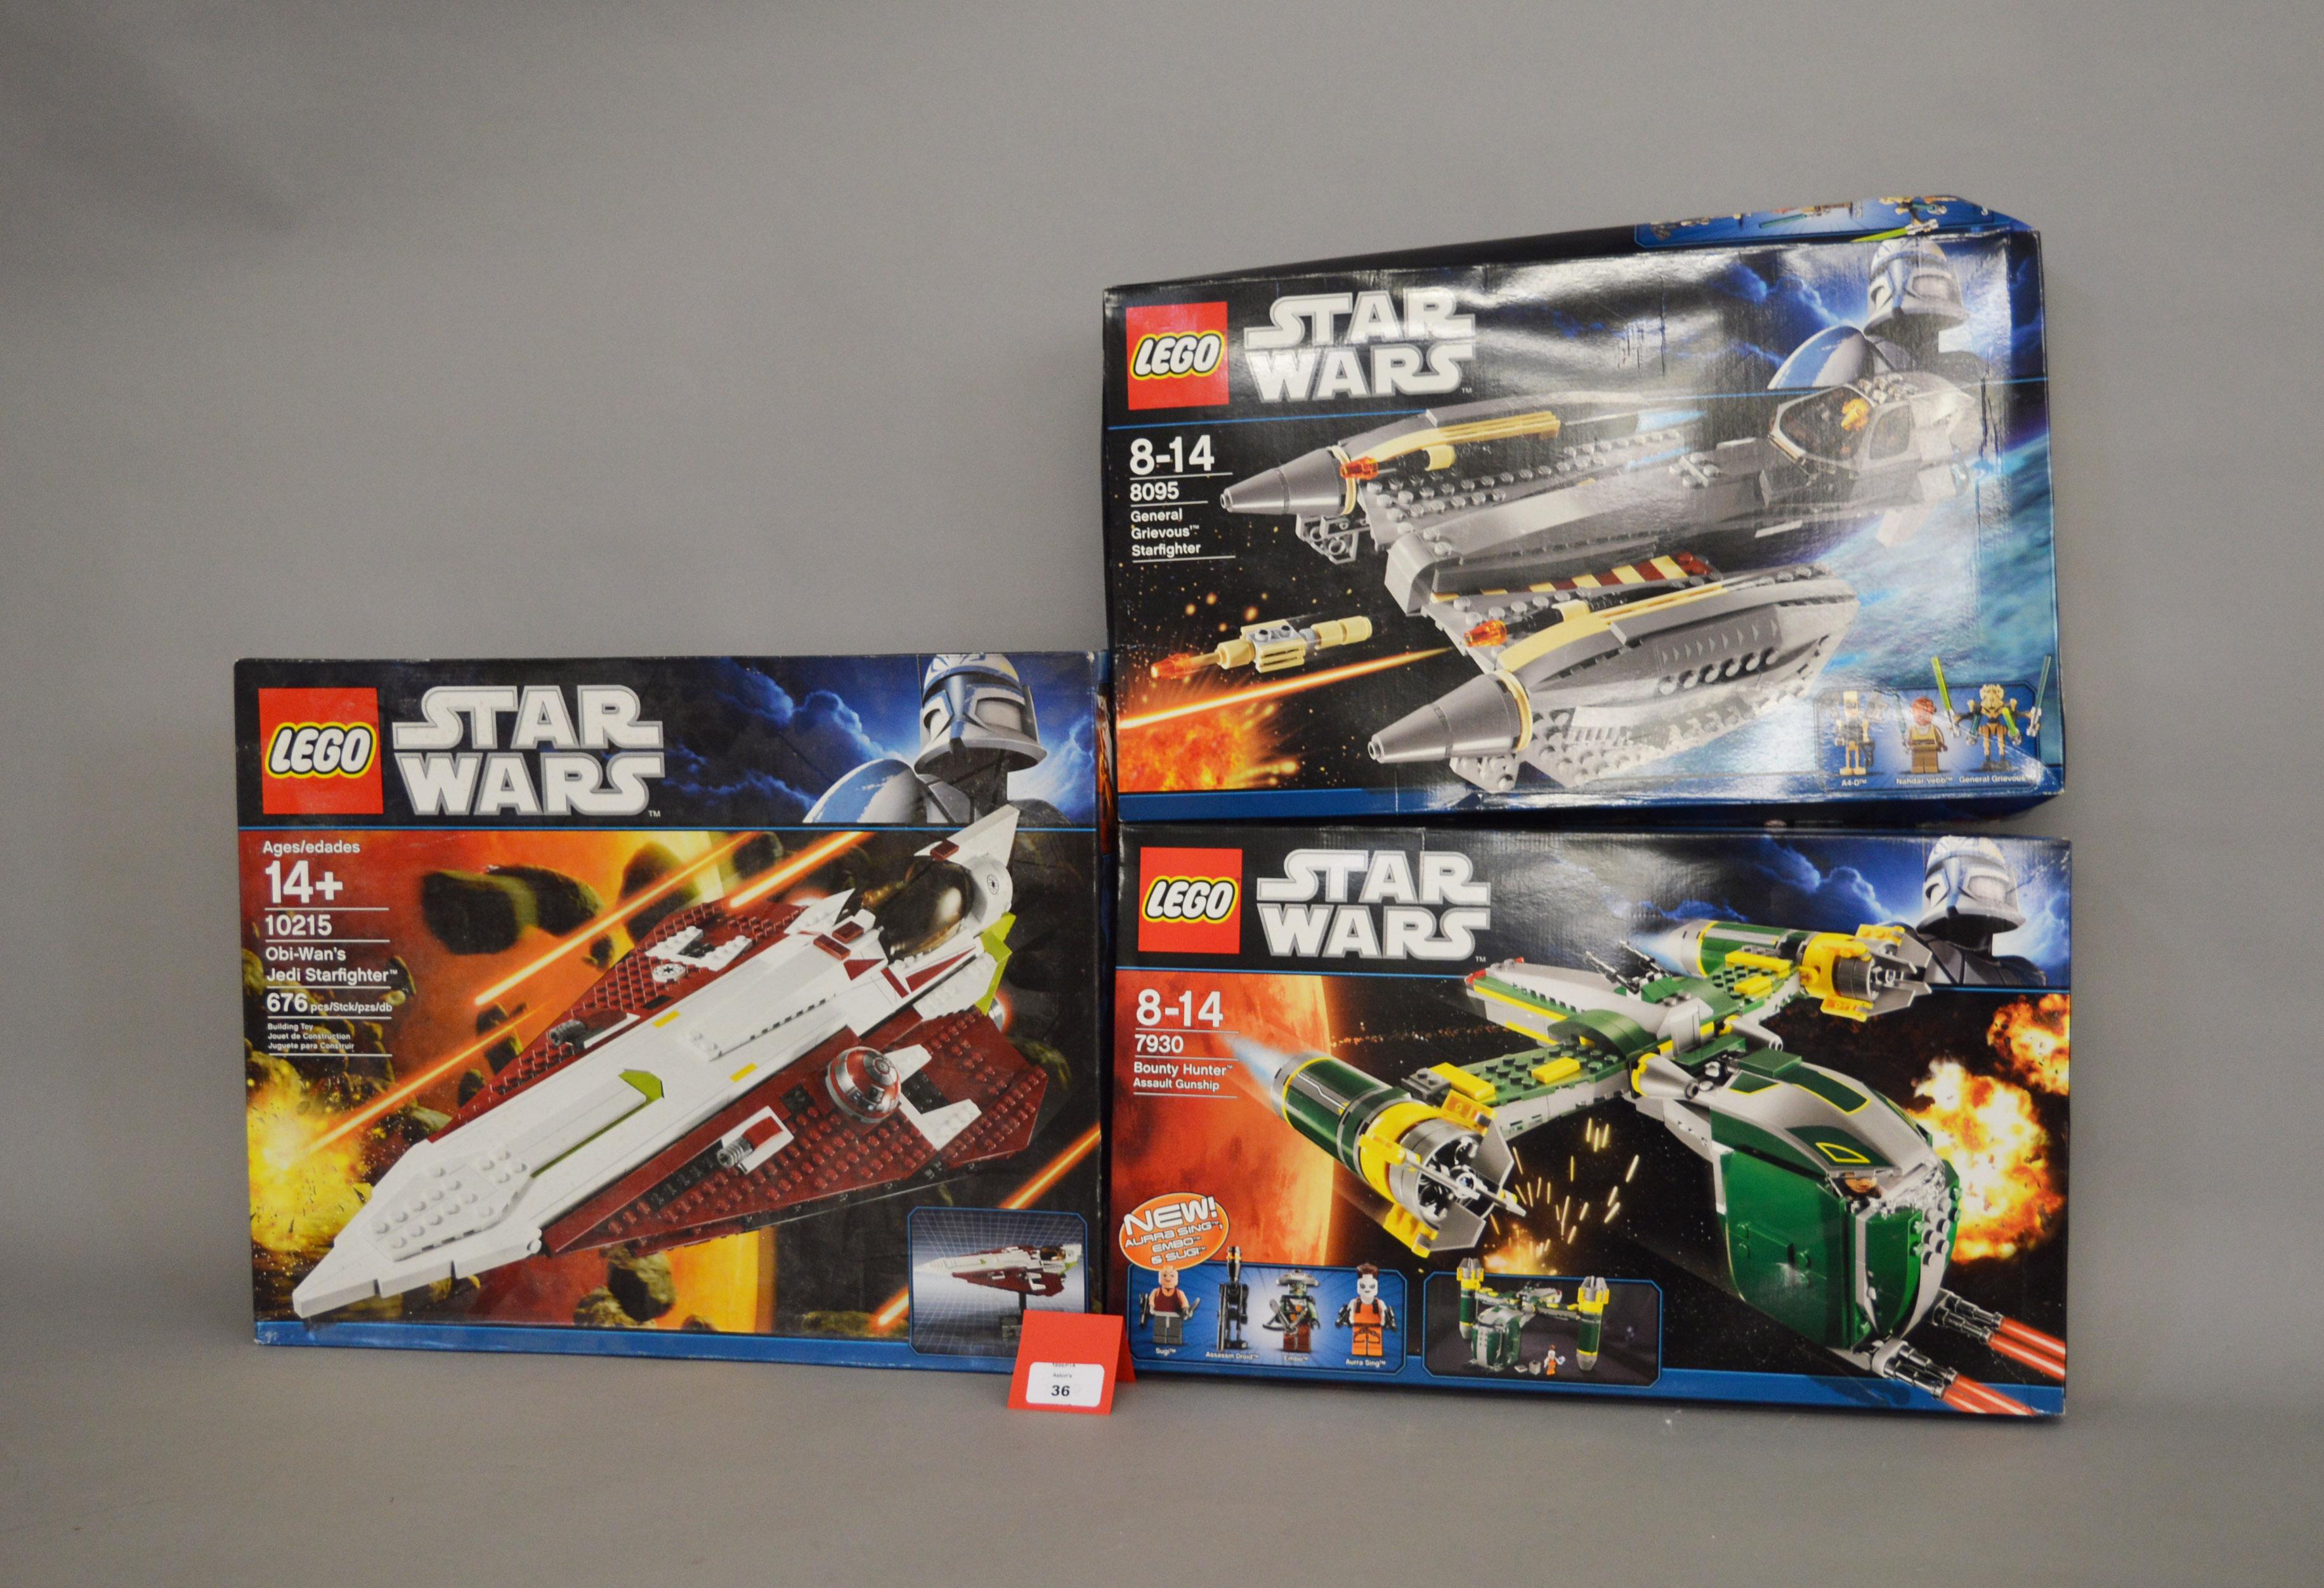 Lot 36 - Three Lego Star Wars sets: 10215 Obi-Wan's Jedi Starfighter; 7930 Bounty Hunter Assault Gunship;